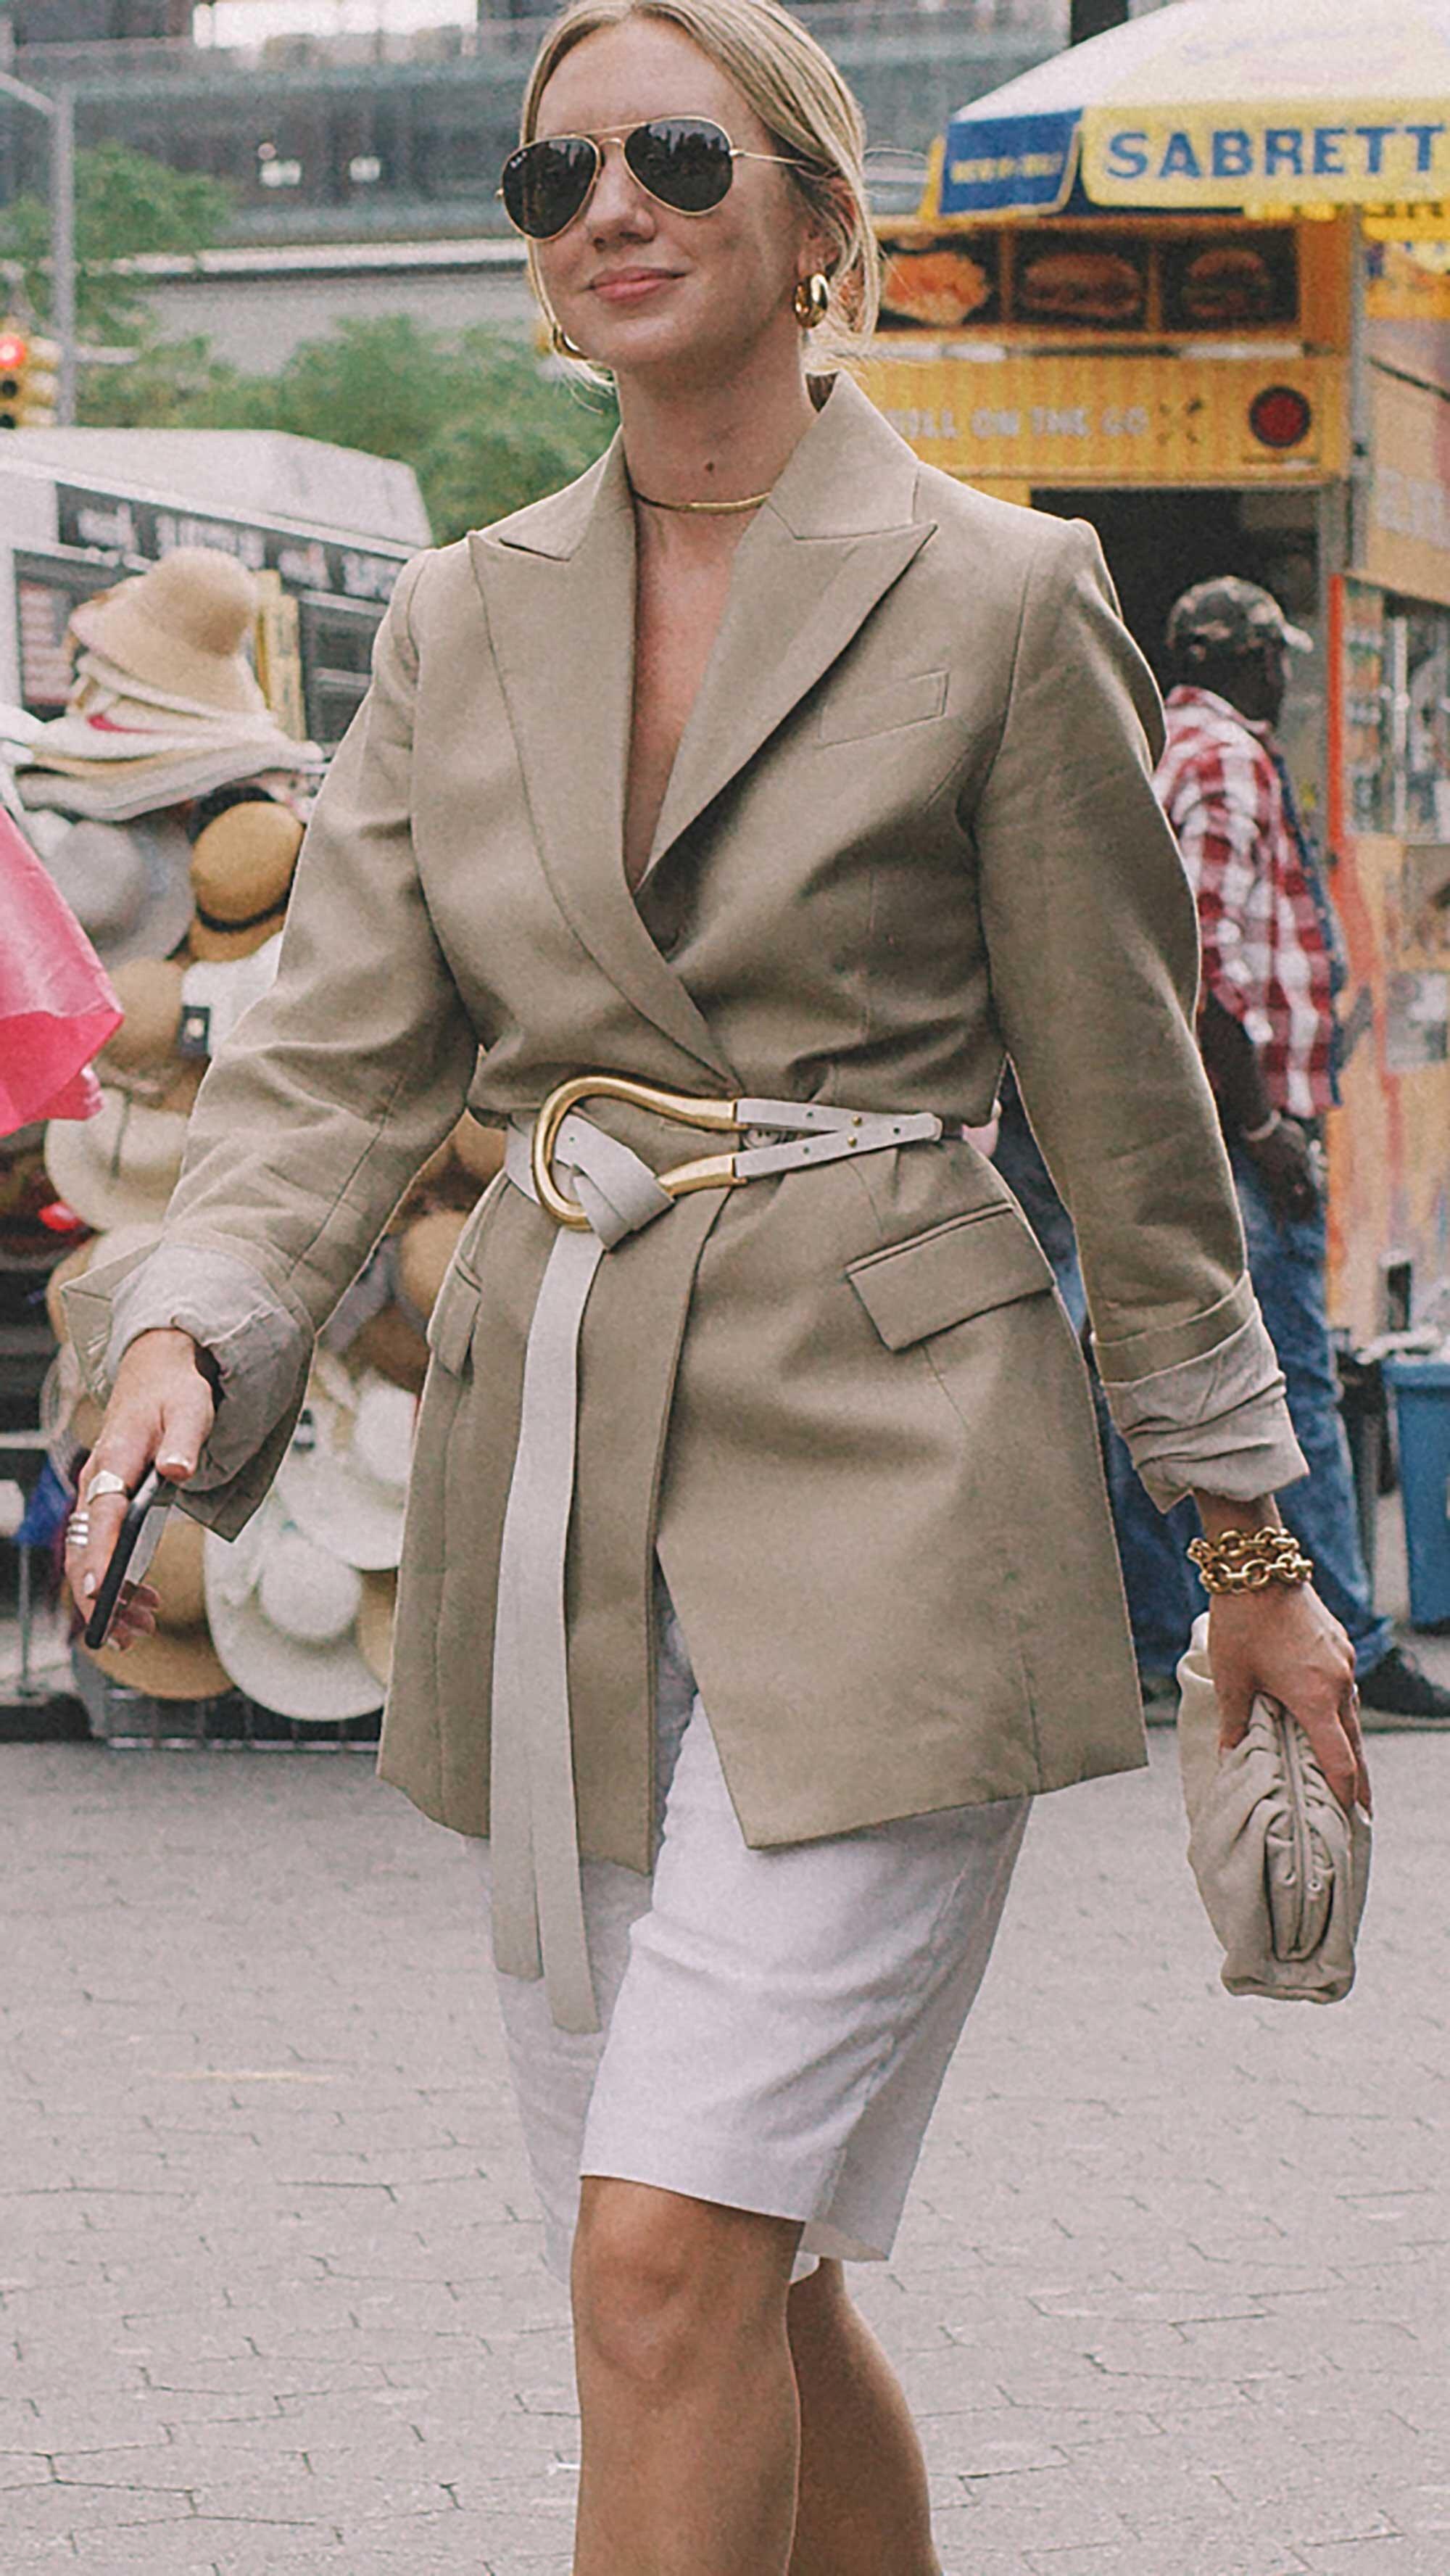 Click for more looks! Best outfits of New York Fashion Week street style 2019 Day Three Photo by @J2martinez Jose J. Martinez www.jmrtnz.com -23.jpg